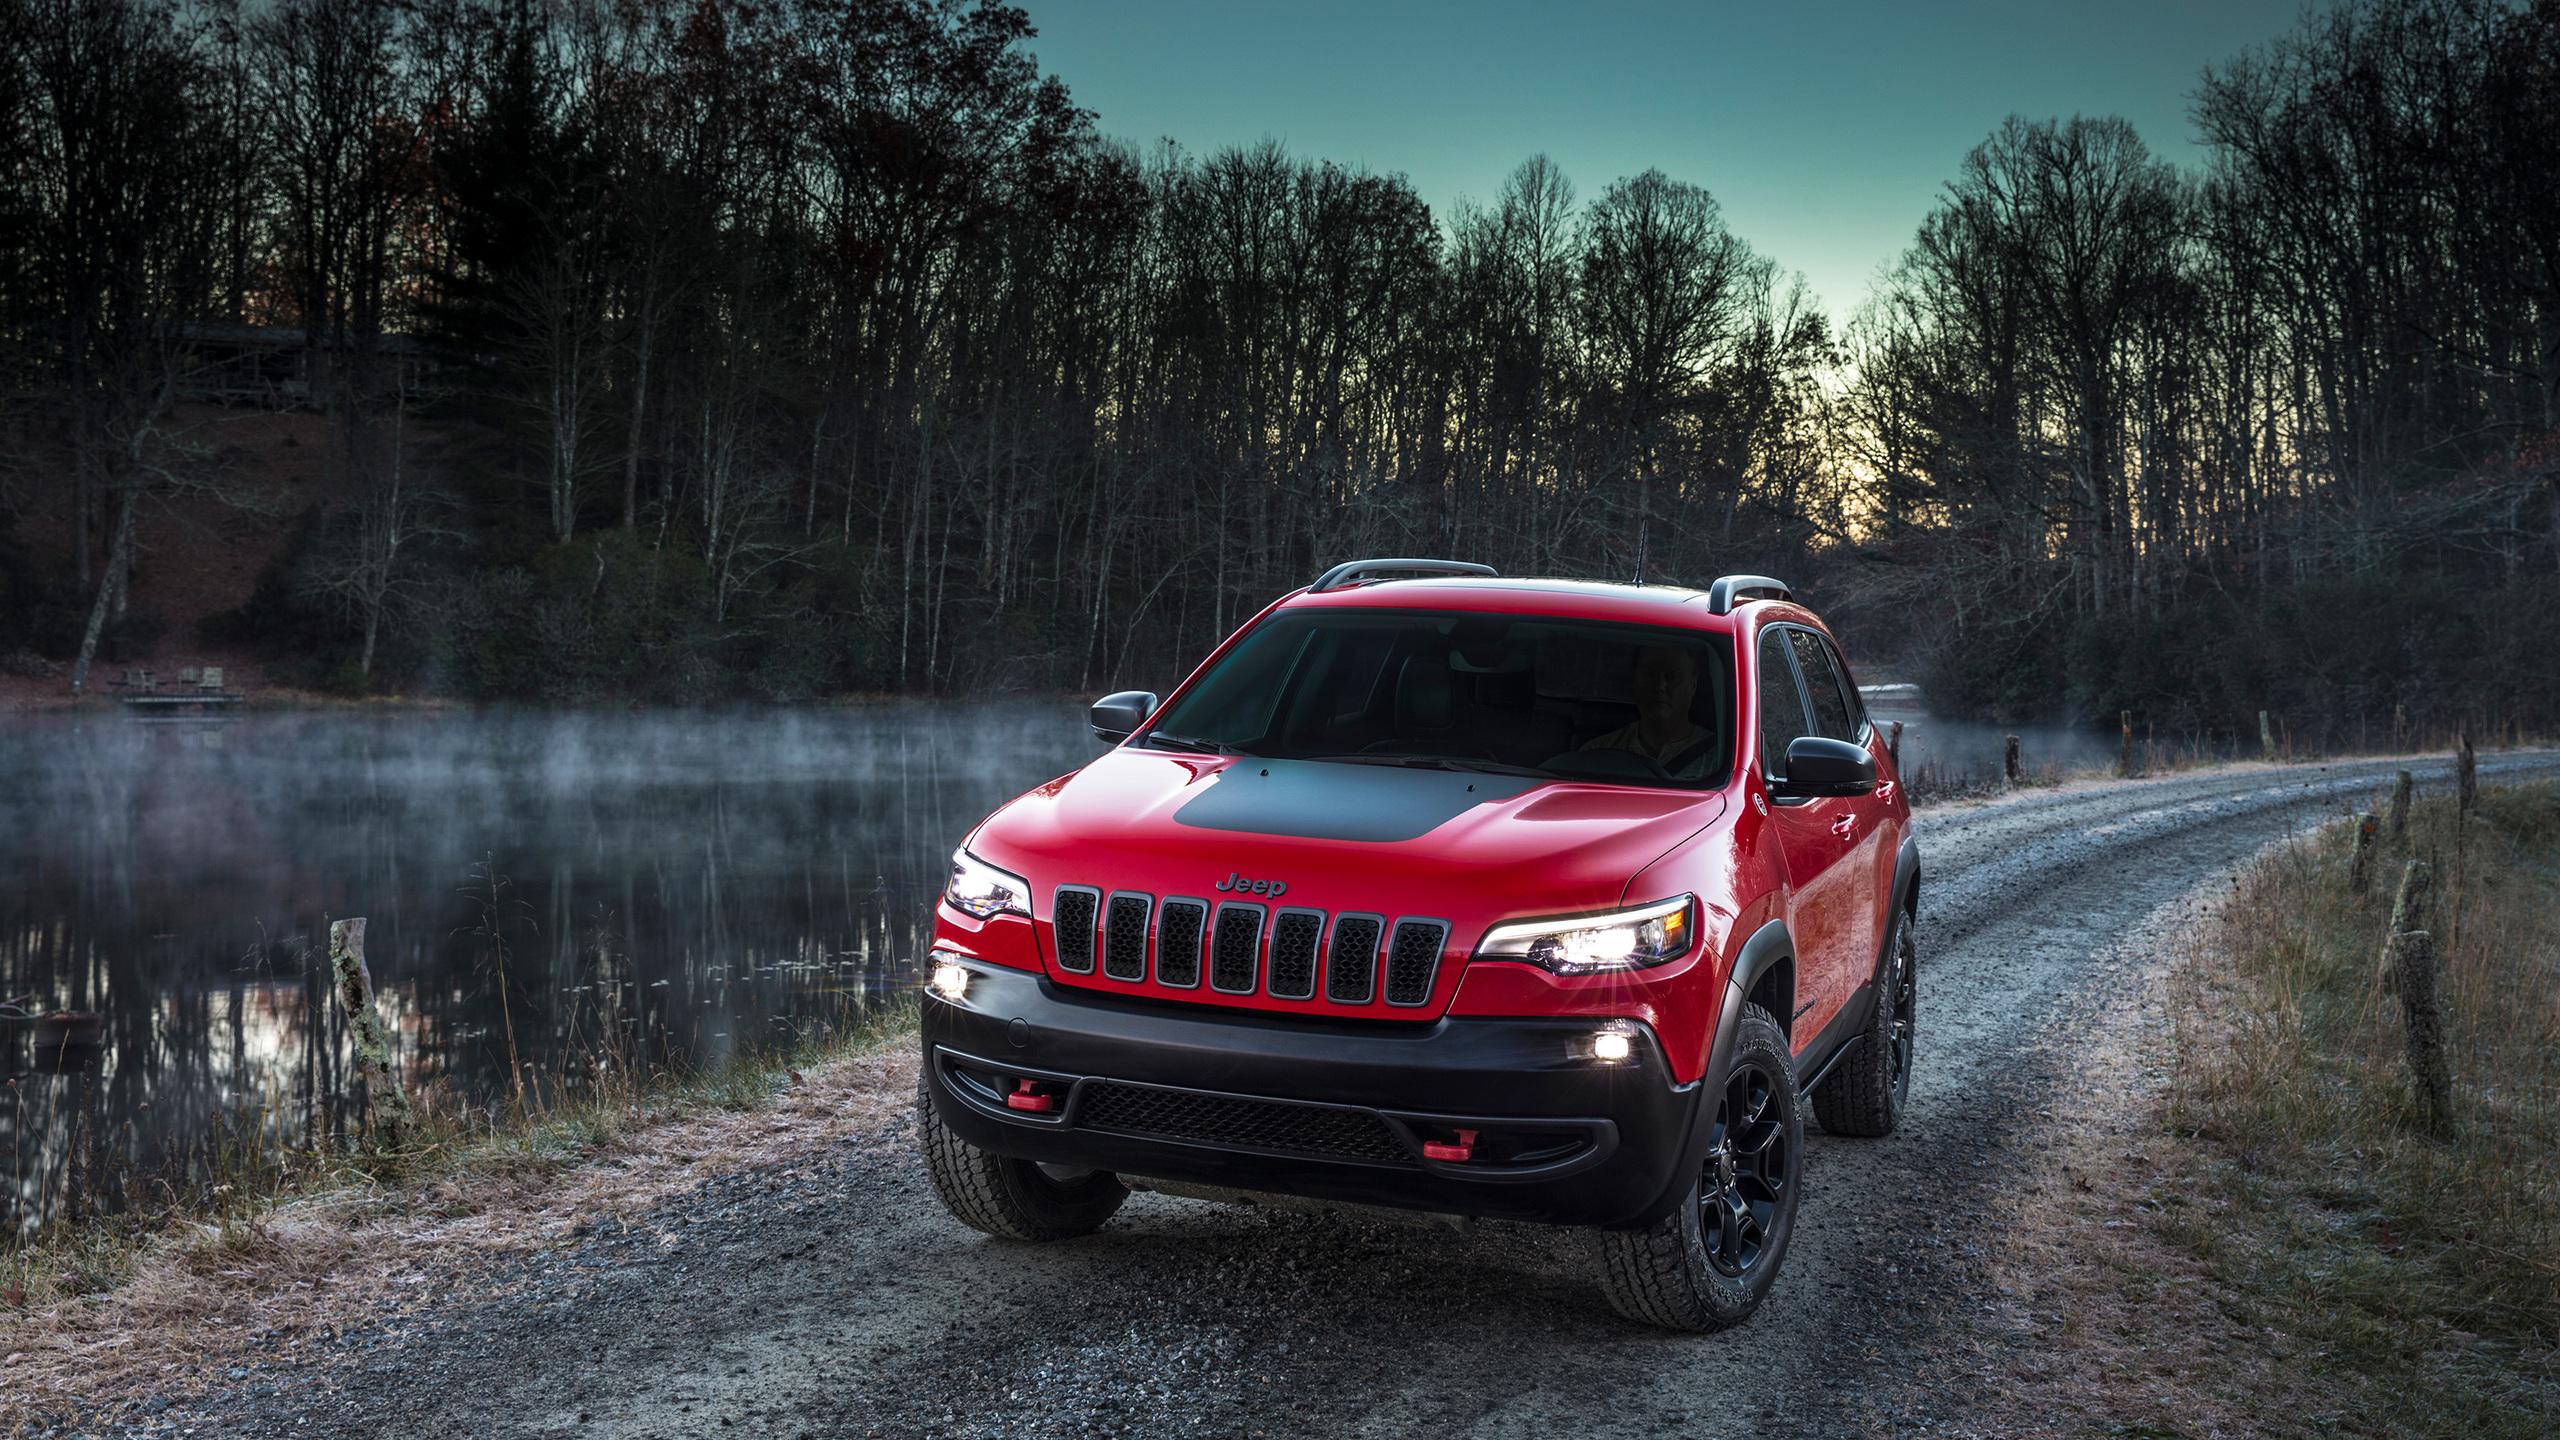 2560x1440 2018 Jeep Cherokee Trailhawk 1440P Resolution HD ...